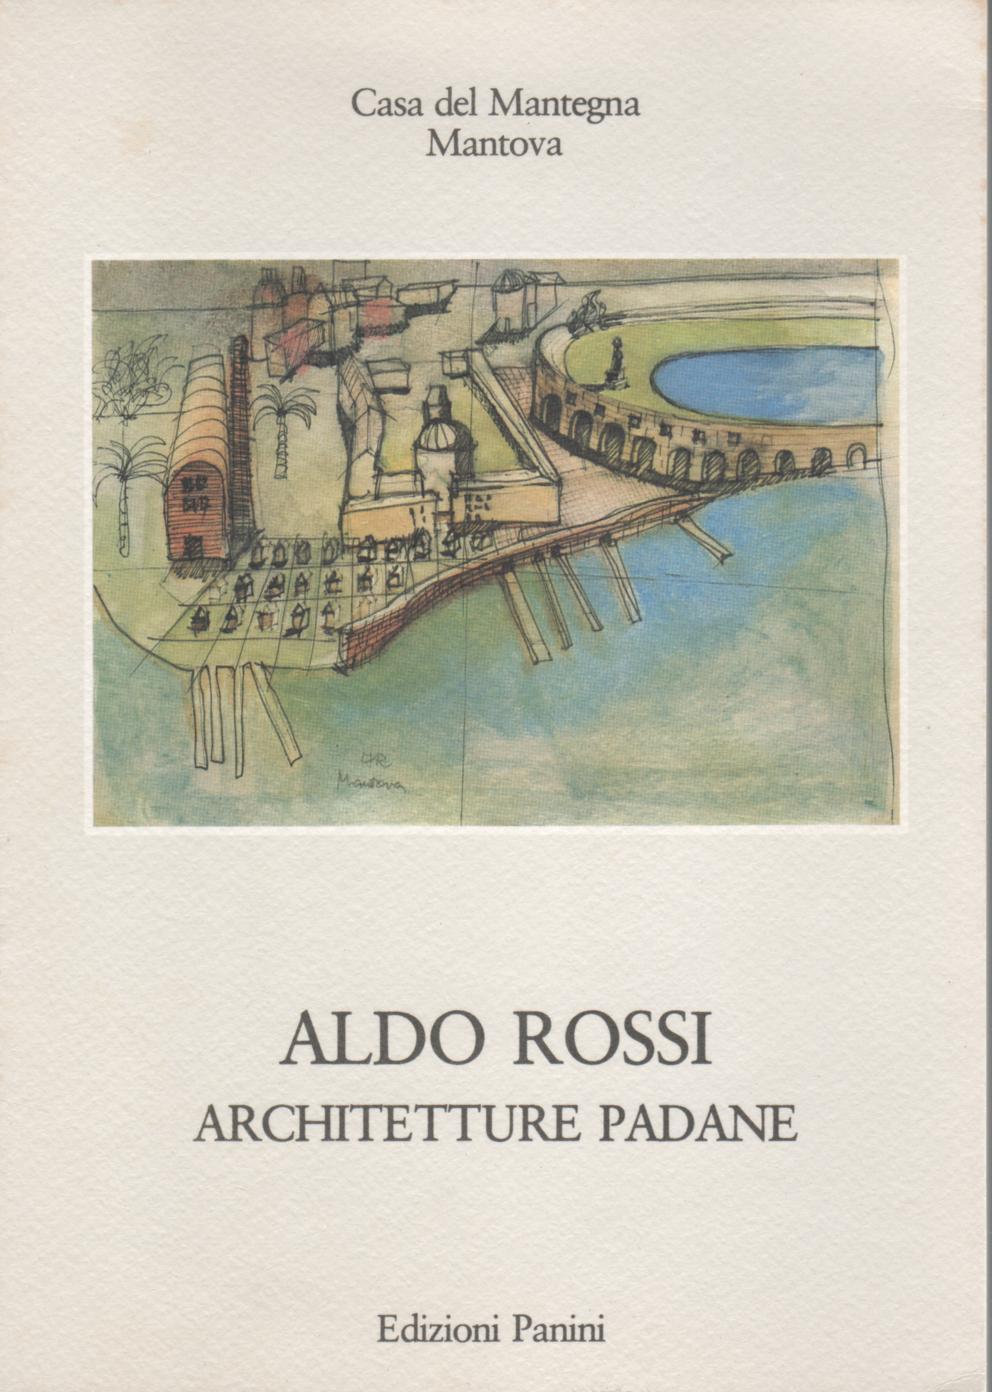 Aldo Rossi, architetture padane